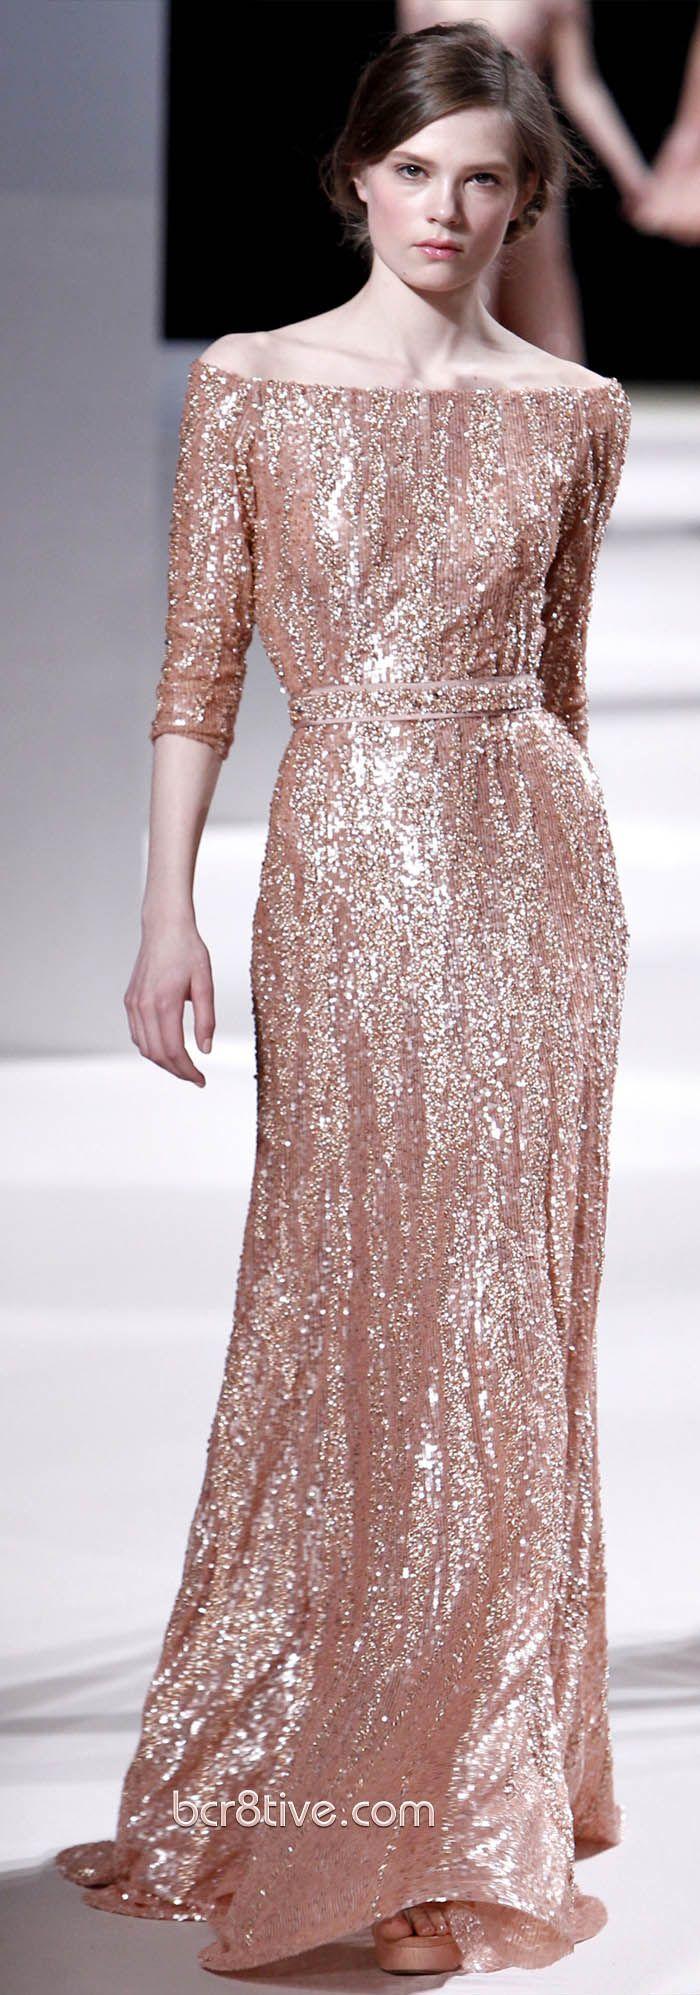 best womenus fashion images on pinterest fall winter fashion